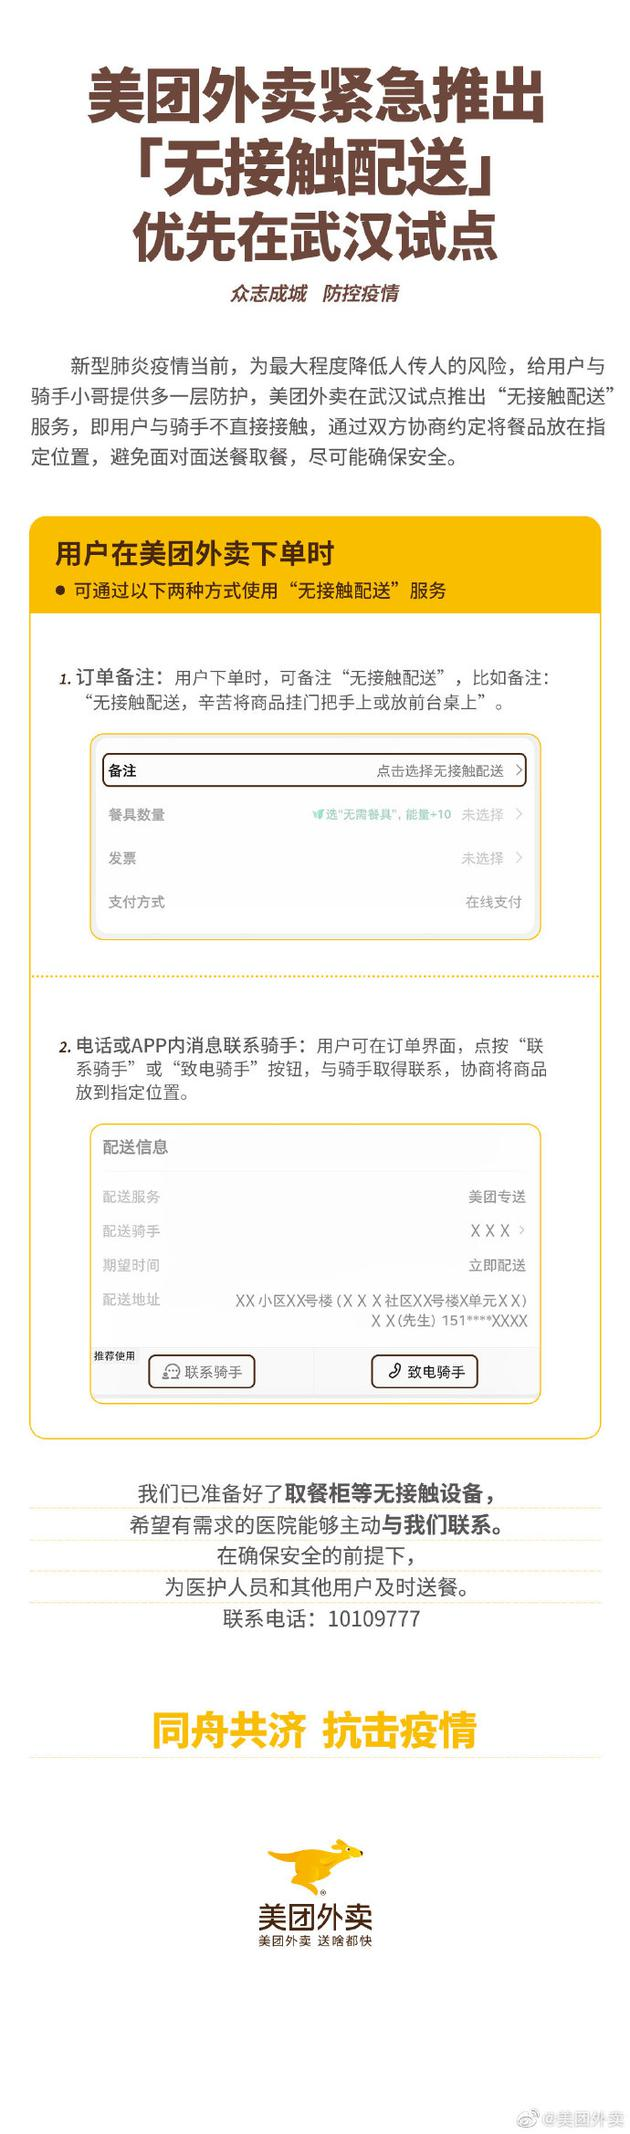 http://www.shangoudaohang.com/chukou/284111.html